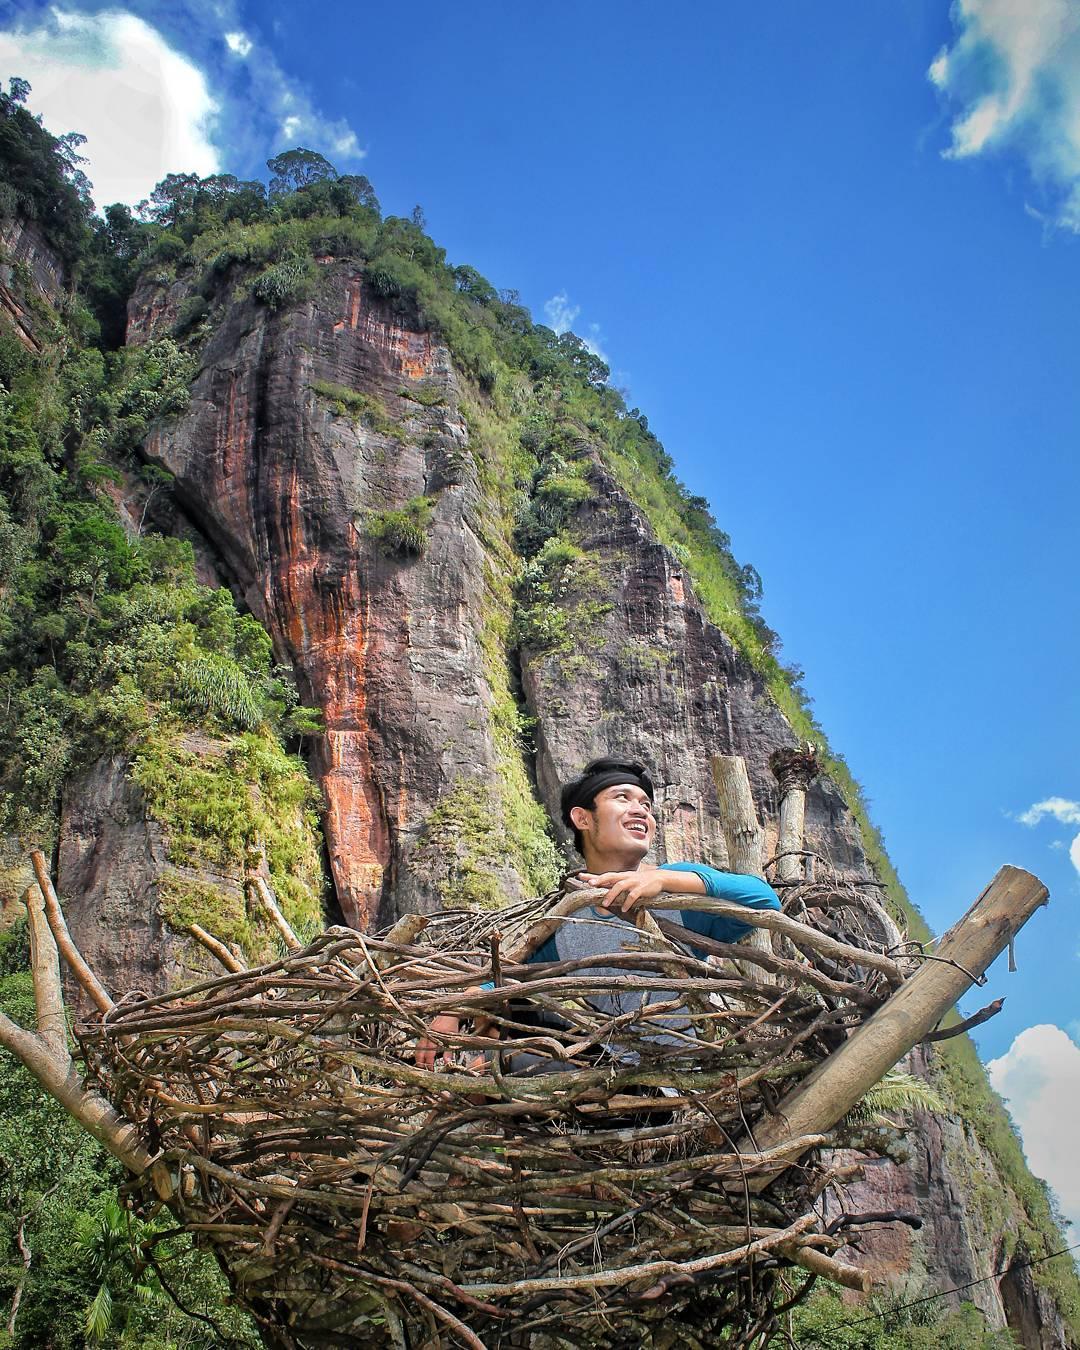 Spot Foto instagramable Di Lembah Harau